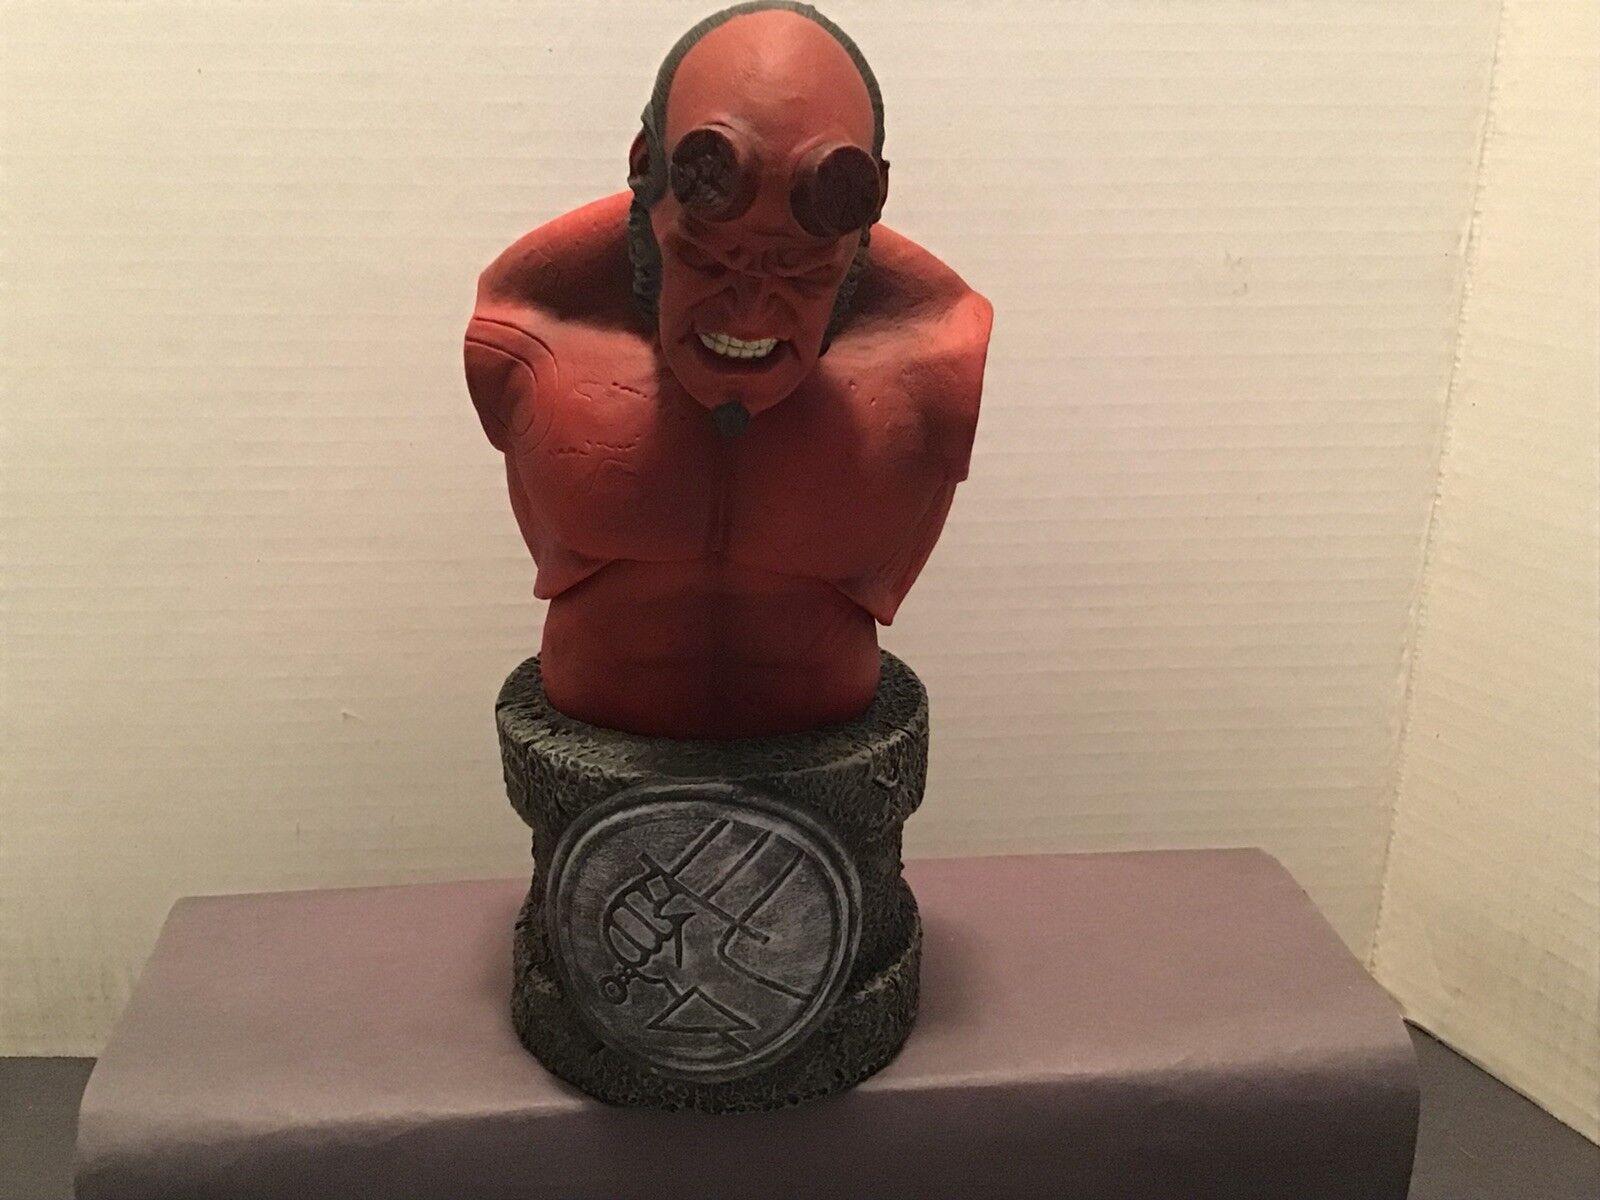 Mezco Mezco Mezco Hellboy II The golden Army - Hellboy Bust e8baaf